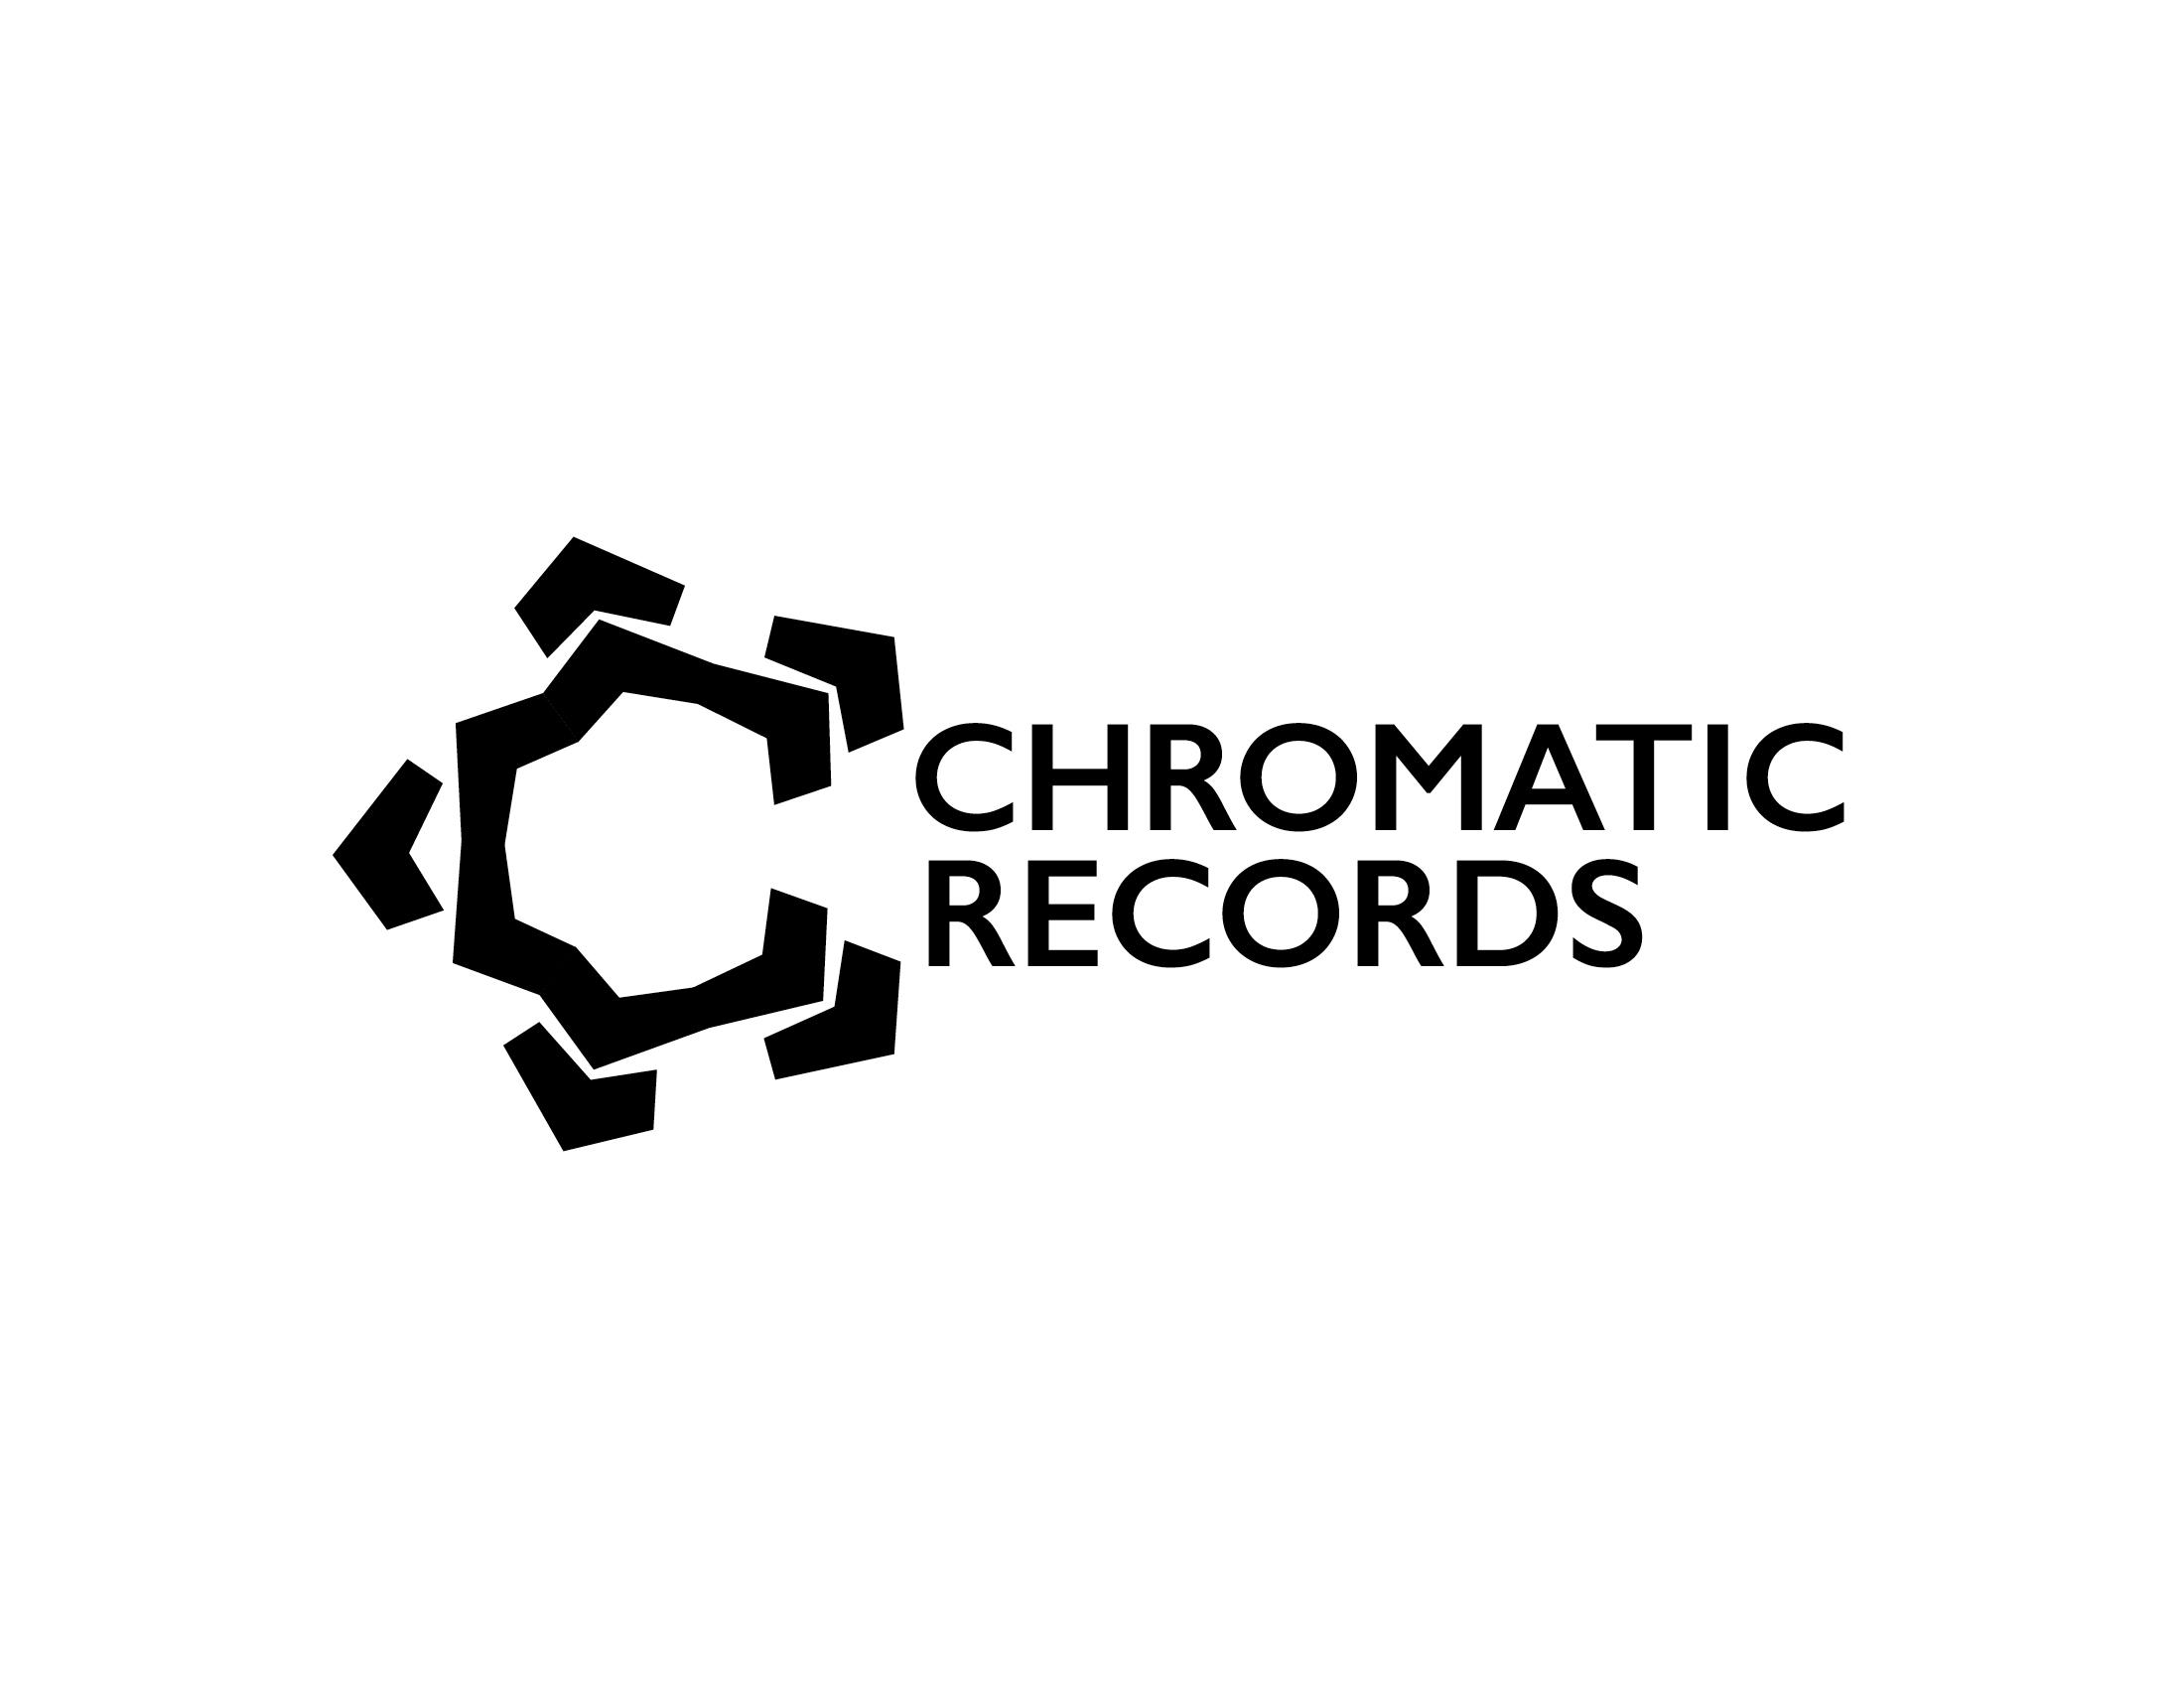 Chromatic Records